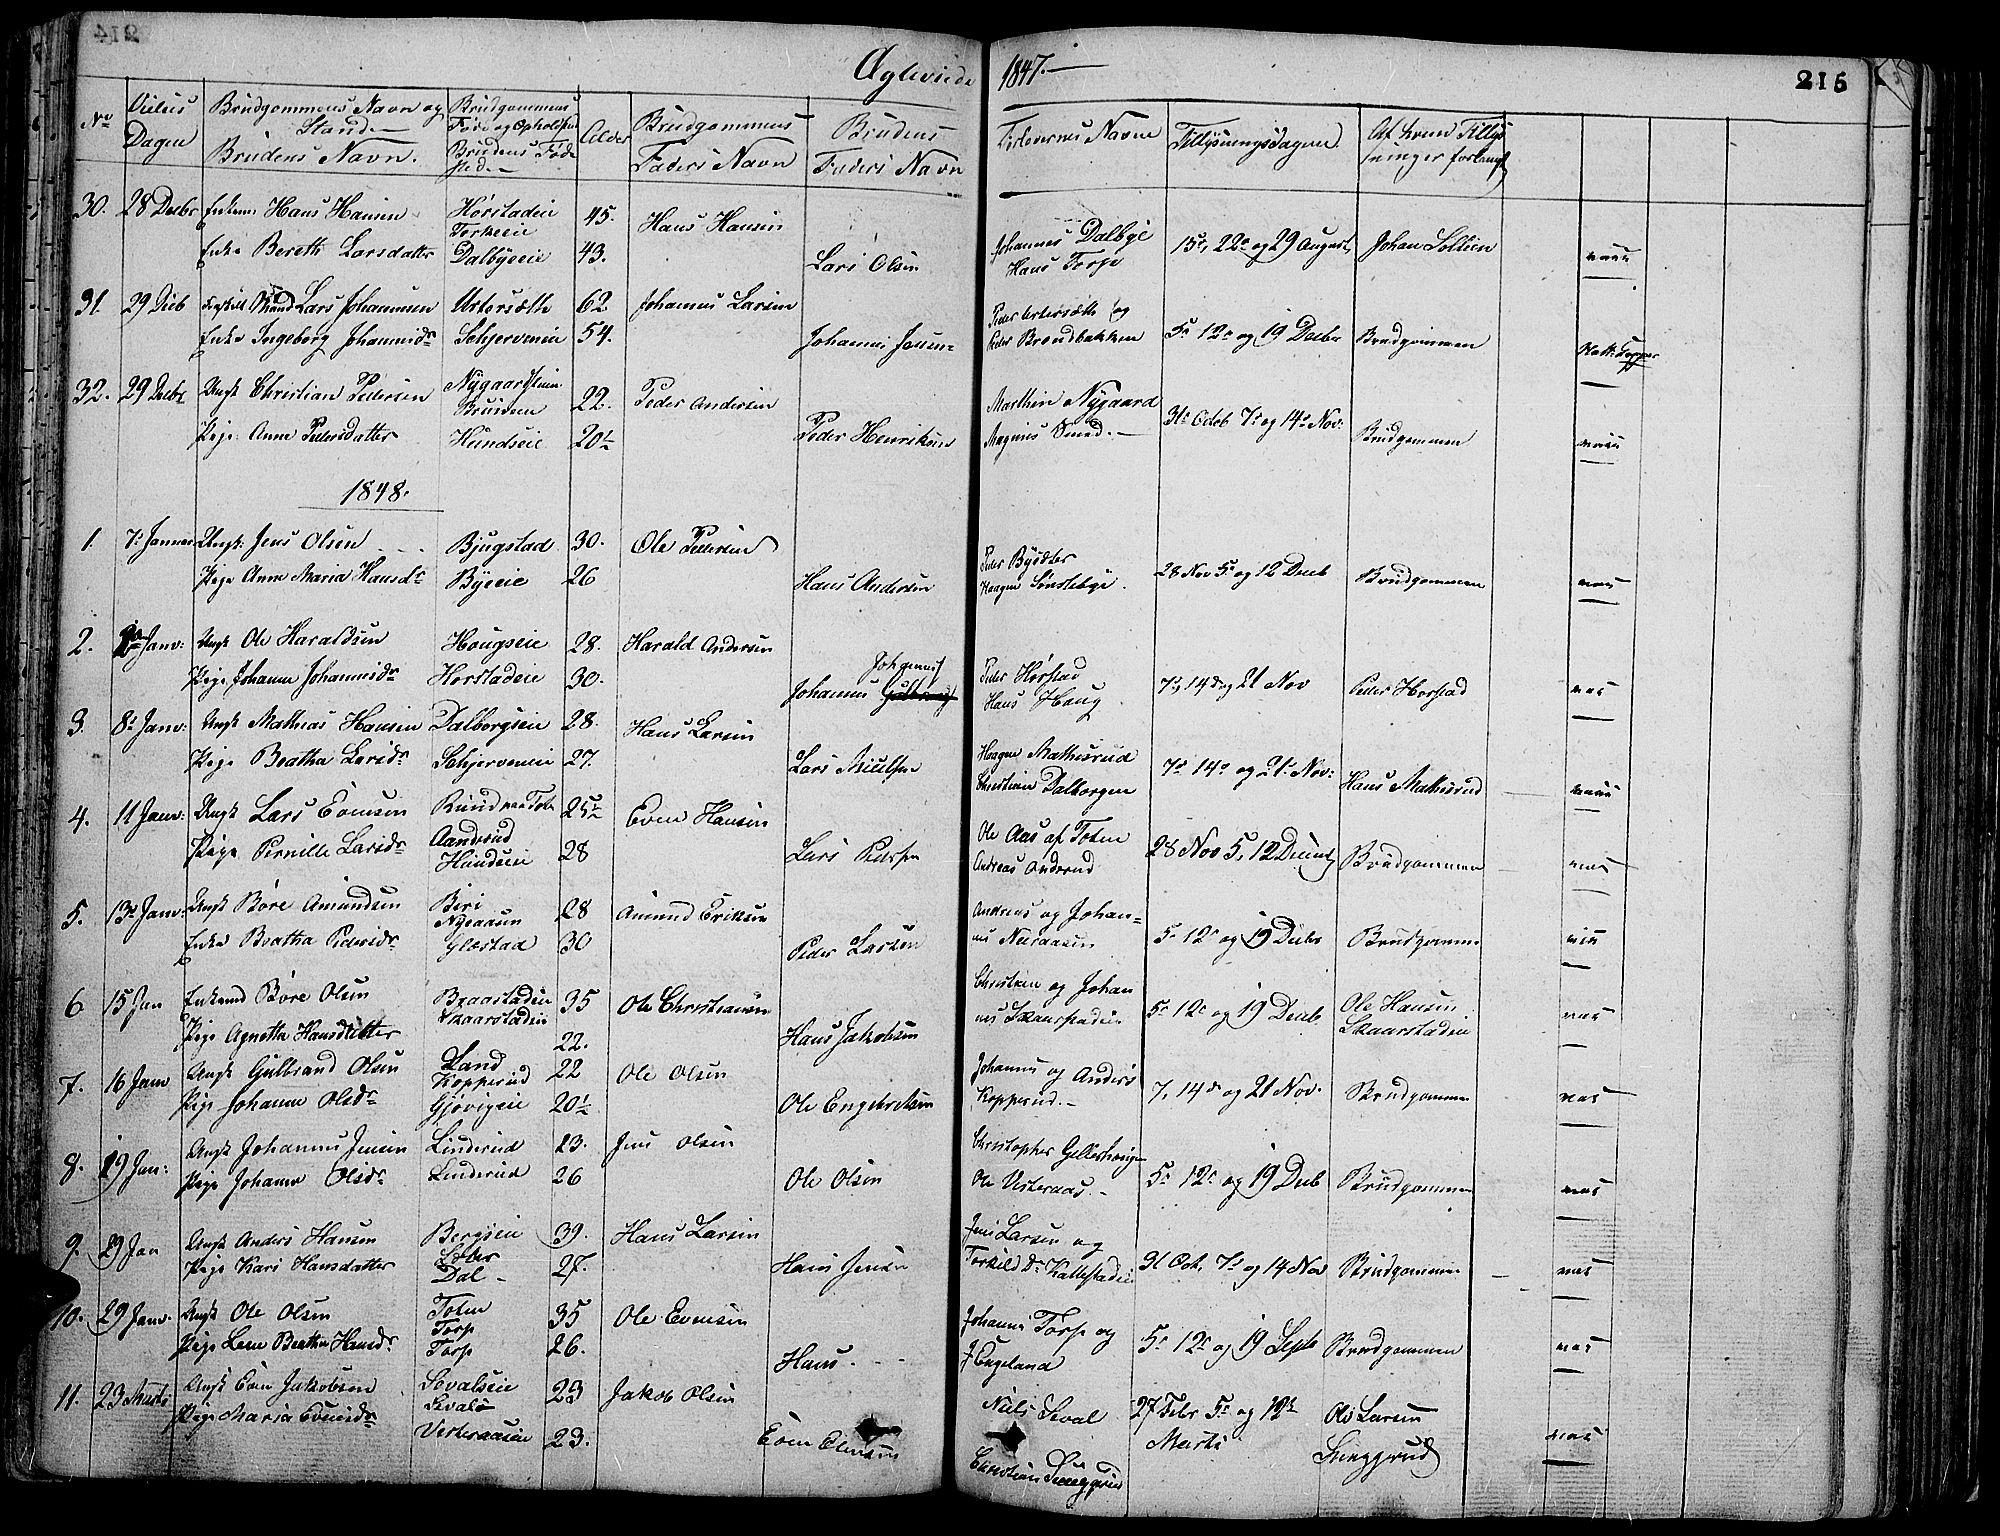 SAH, Vardal prestekontor, H/Ha/Hab/L0004: Klokkerbok nr. 4, 1831-1853, s. 215